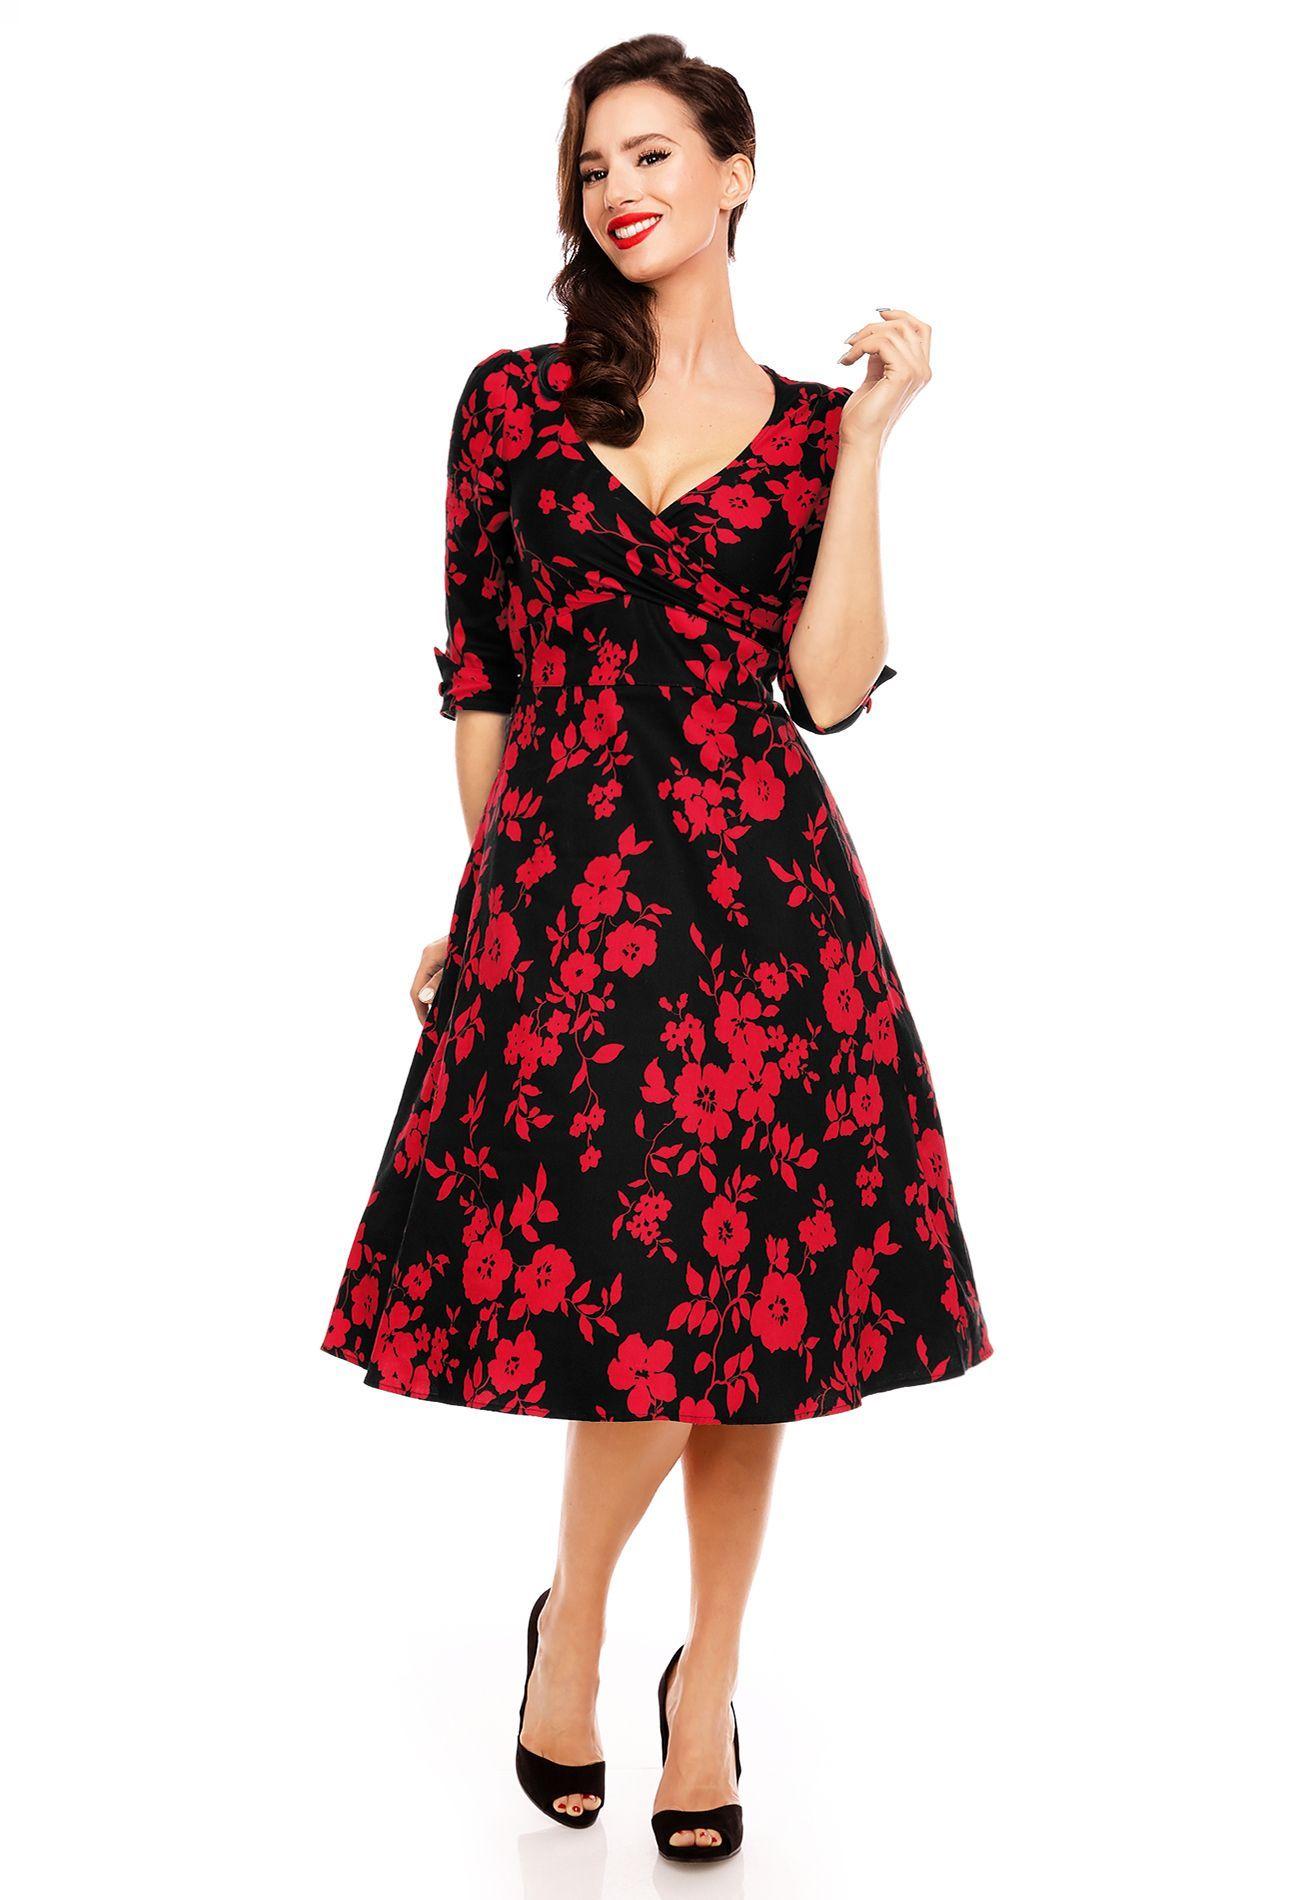 Katherine long sleeve us style swing dress in blackred floral